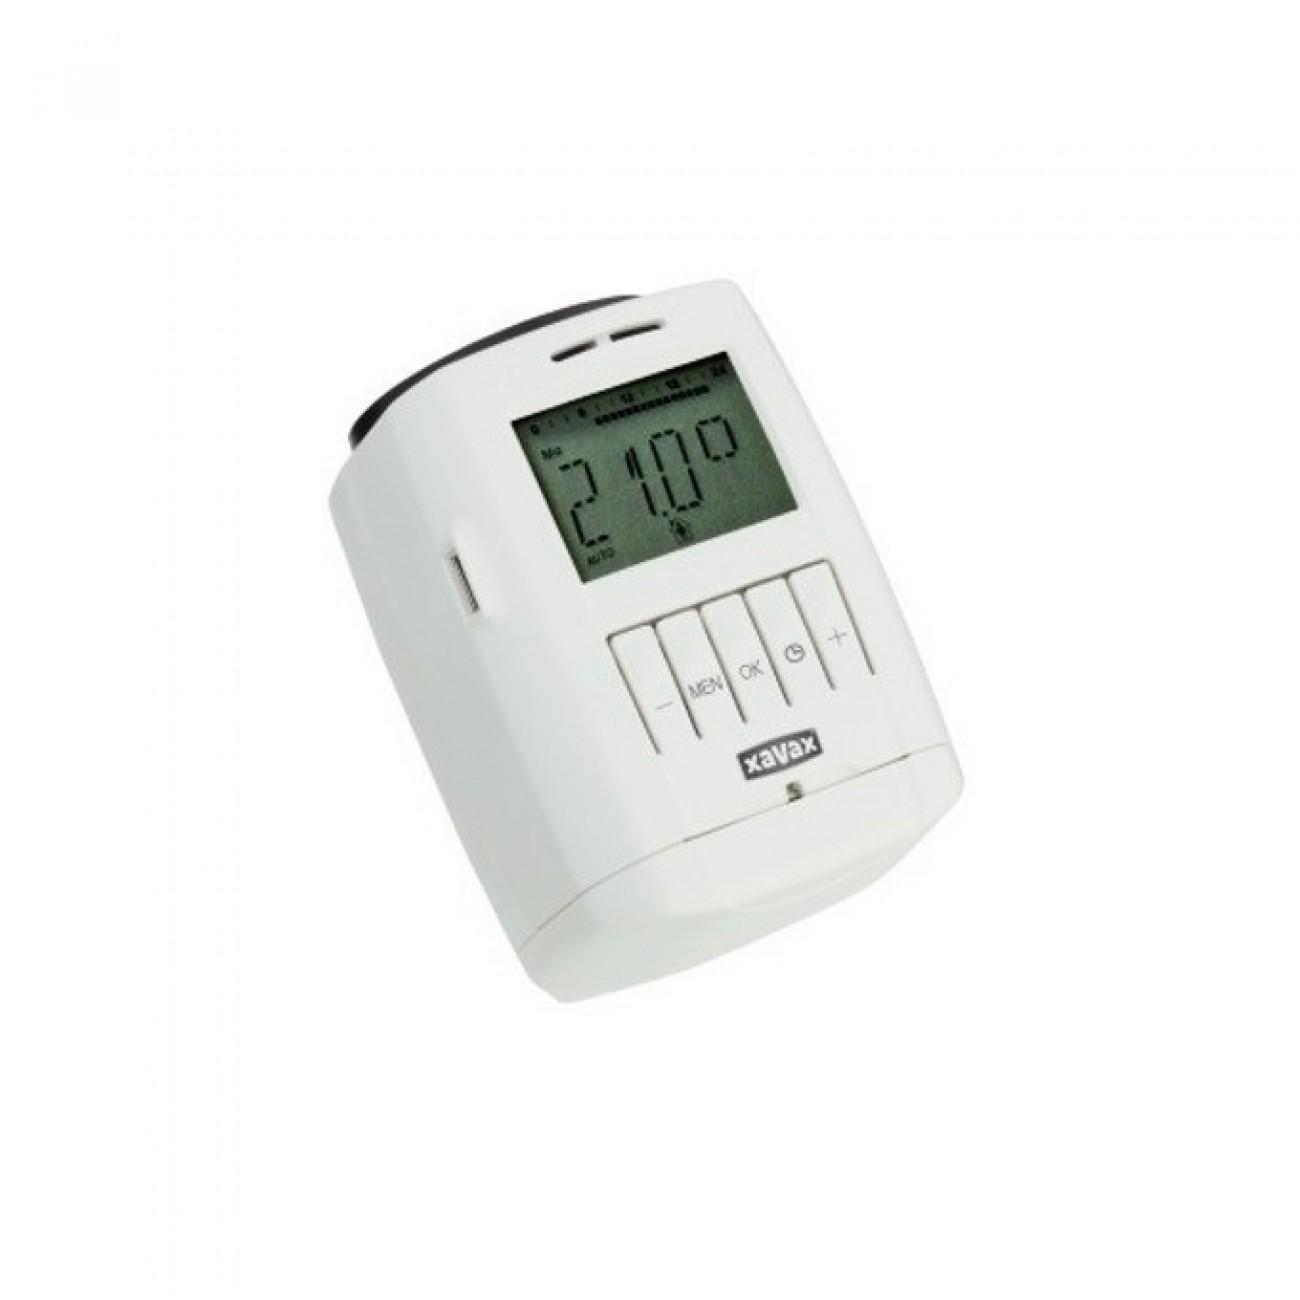 Терморегулатор Hama 111972, за радиатор, 8 програми, размер на резбата M30x1,5 в Друга Електроника за дома -  | Alleop